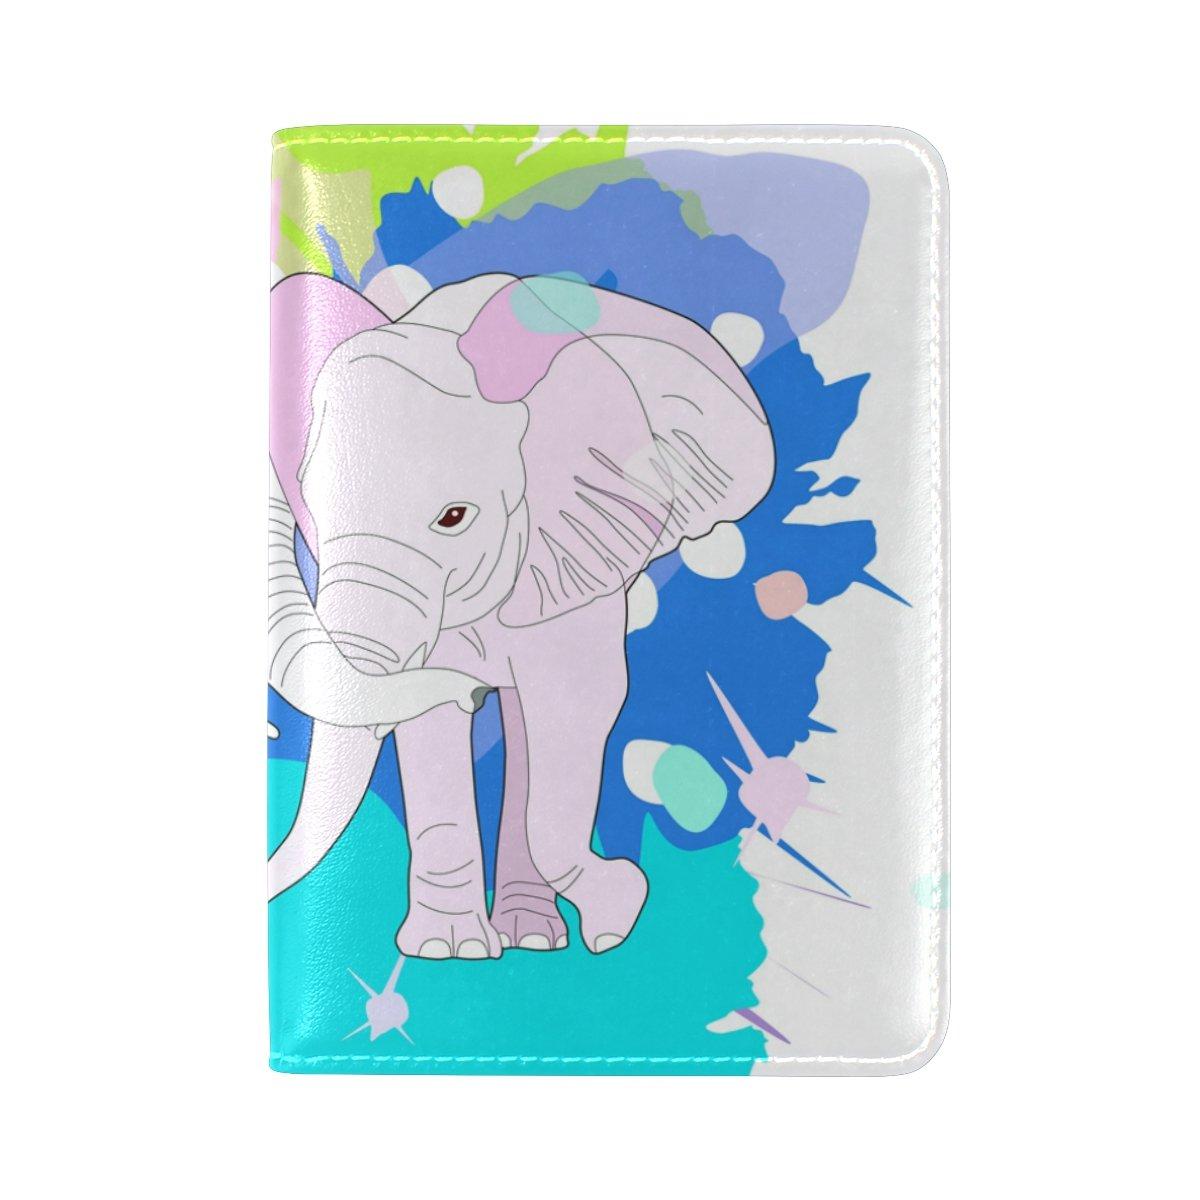 YuihomeCute 象のペア本革パスポートホルダーカバーケース 旅行用財布 B07F28NG2G